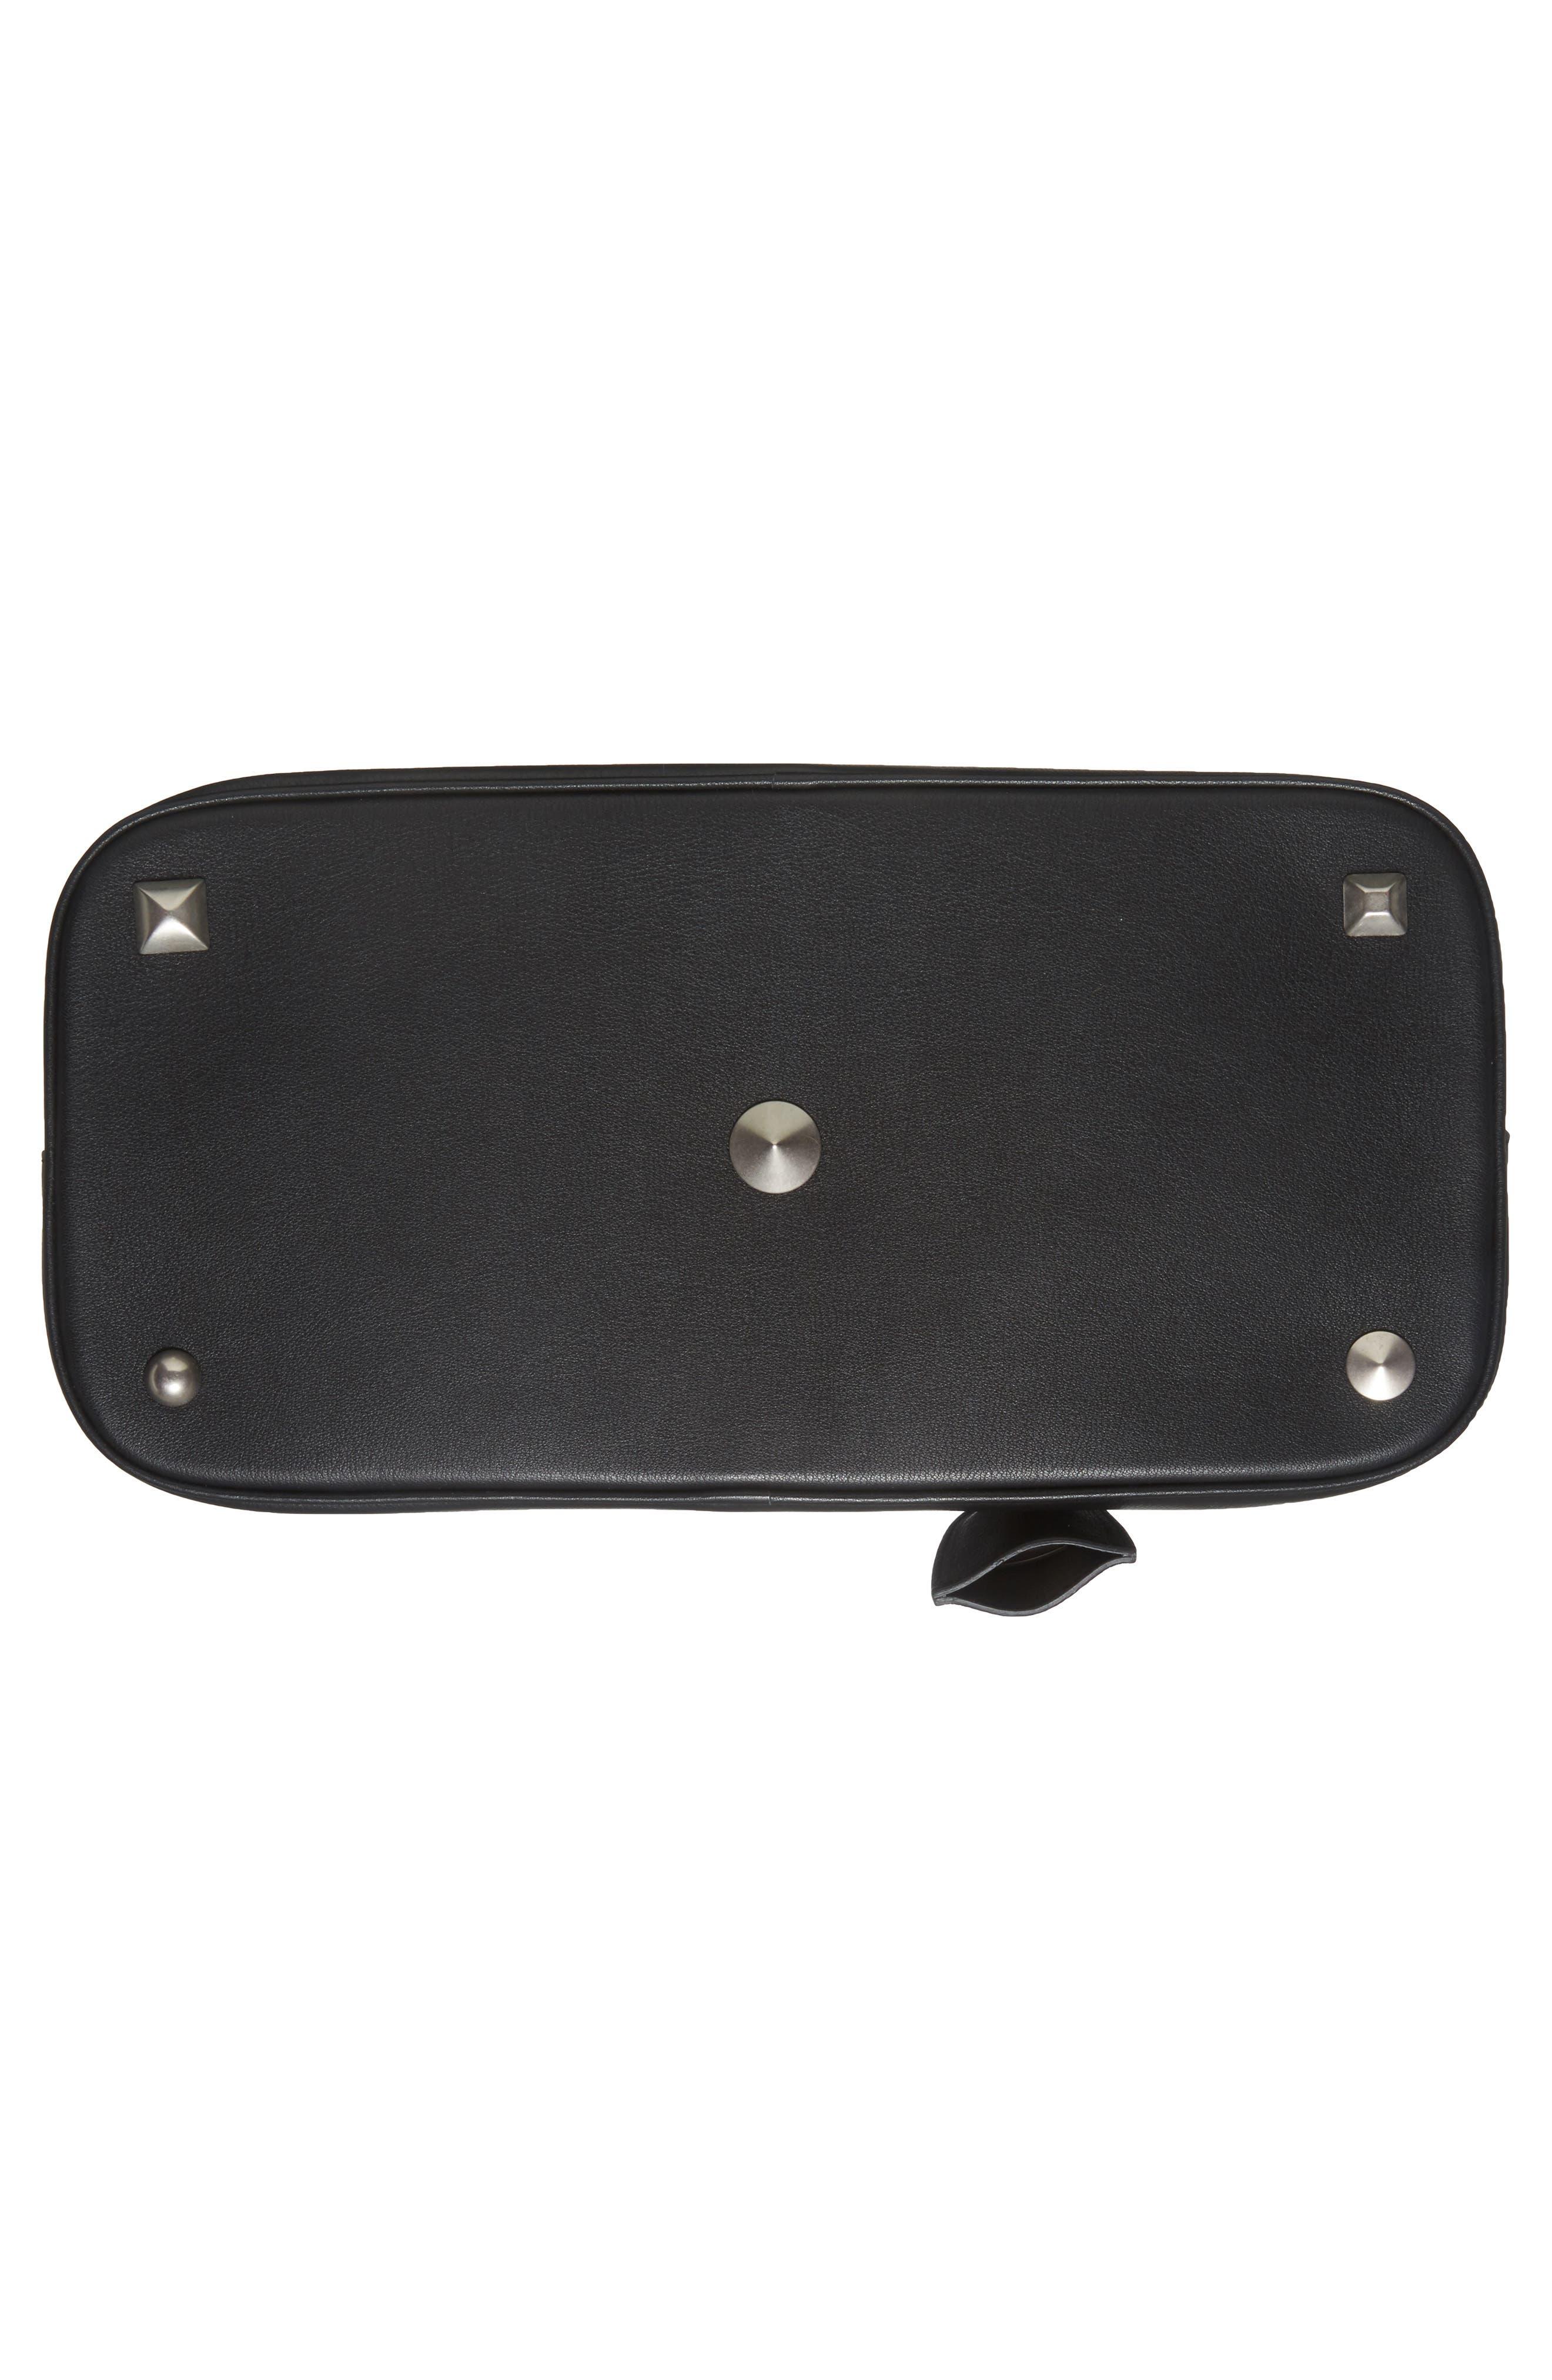 Medium 5AC Leather Handbag,                             Alternate thumbnail 6, color,                             001